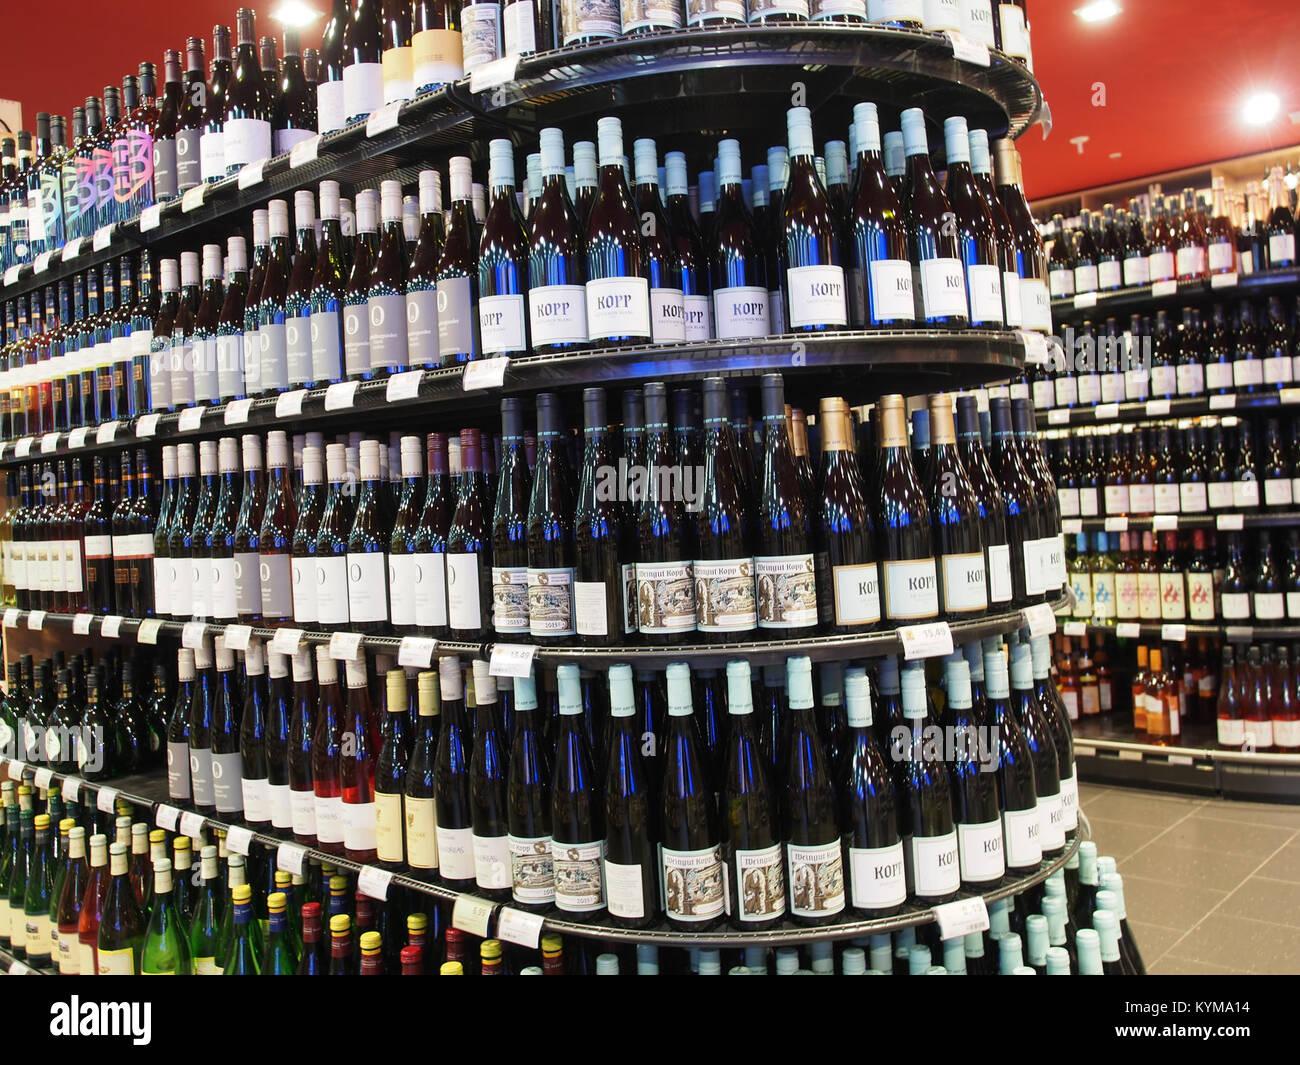 Alkoholische Getränke Stock Photos & Alkoholische Getränke Stock ...